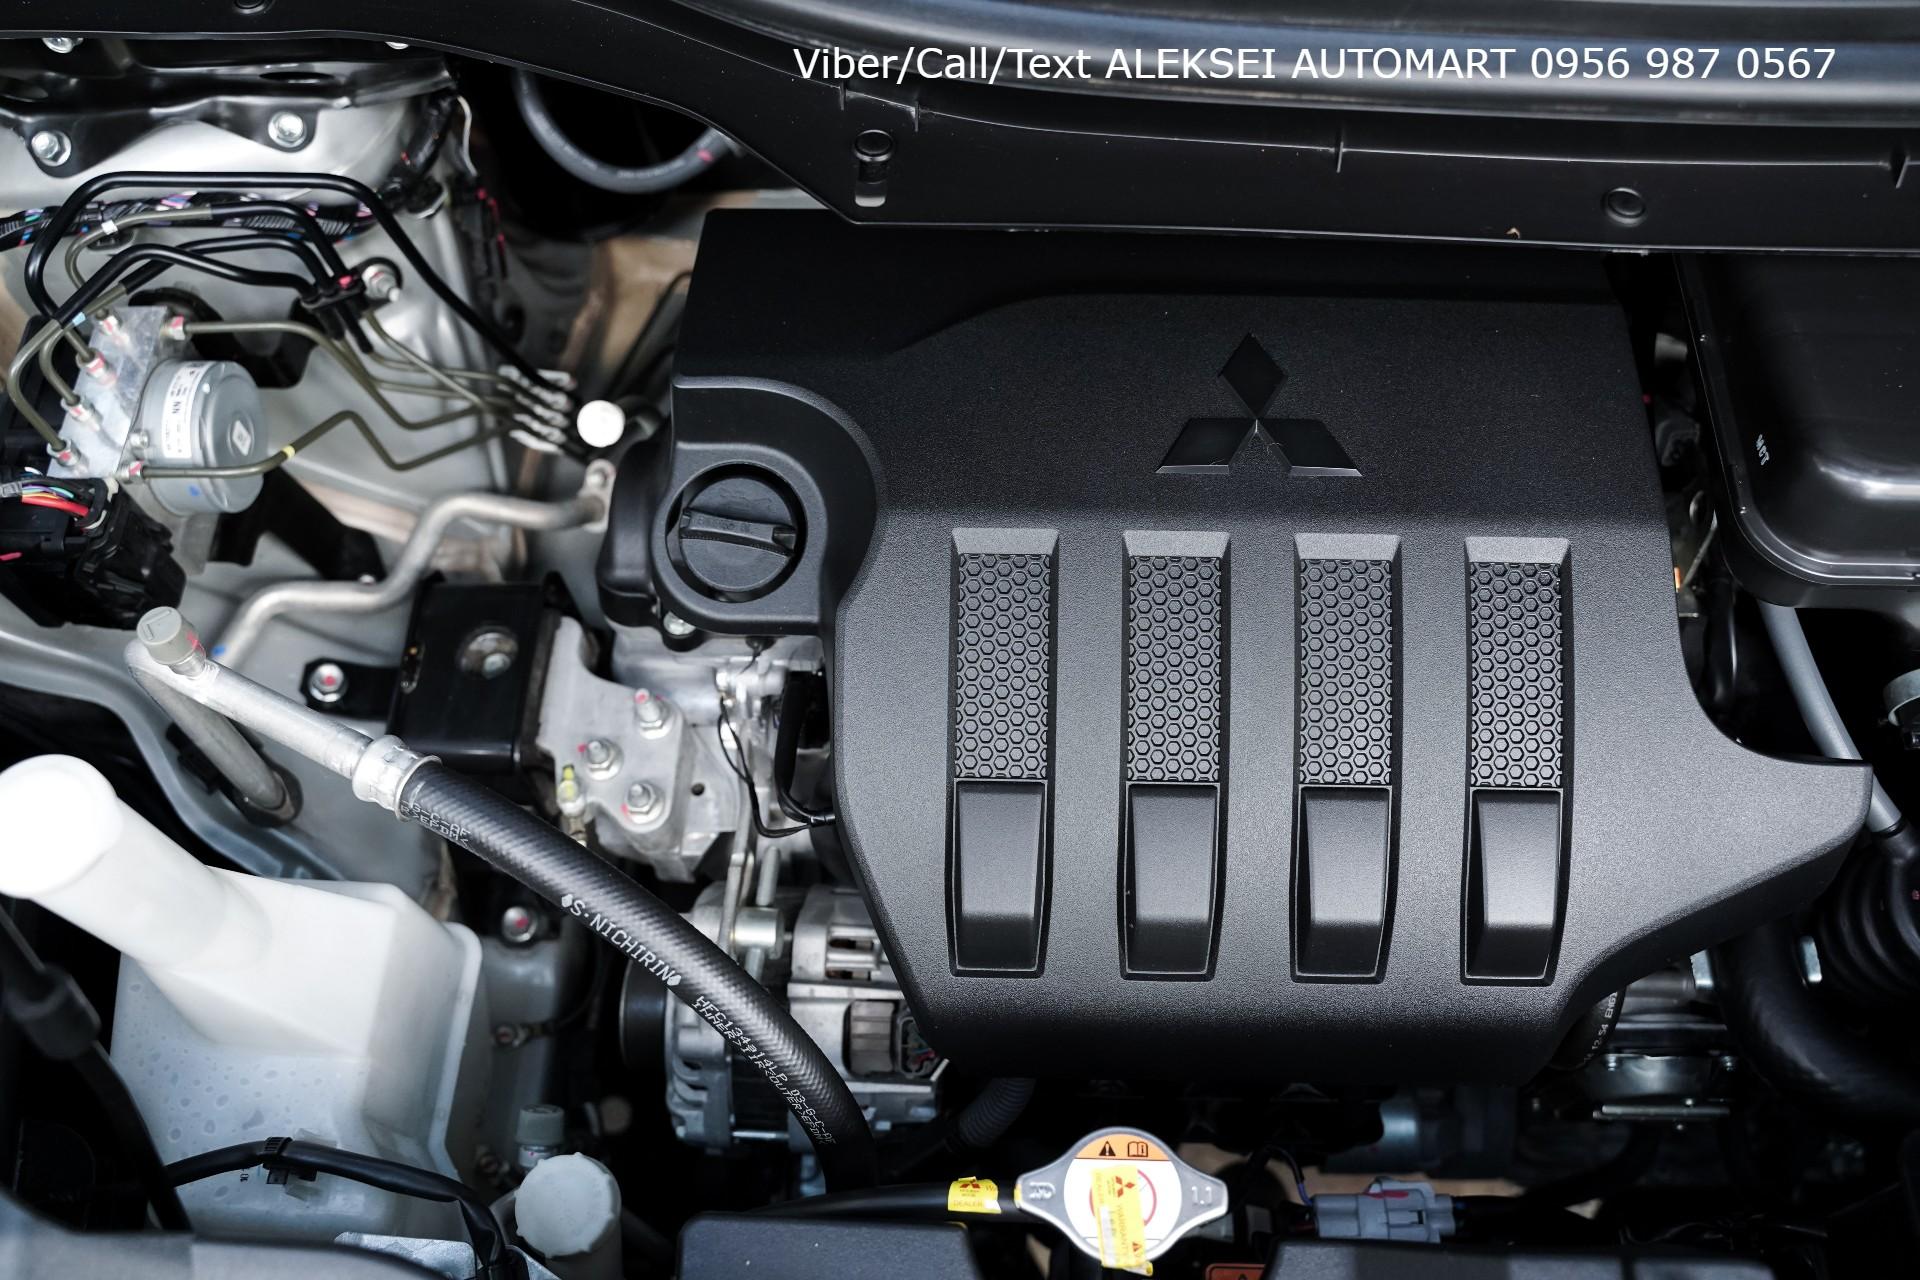 2019 Mitsubishi Xpander GLS 4x2 1.5